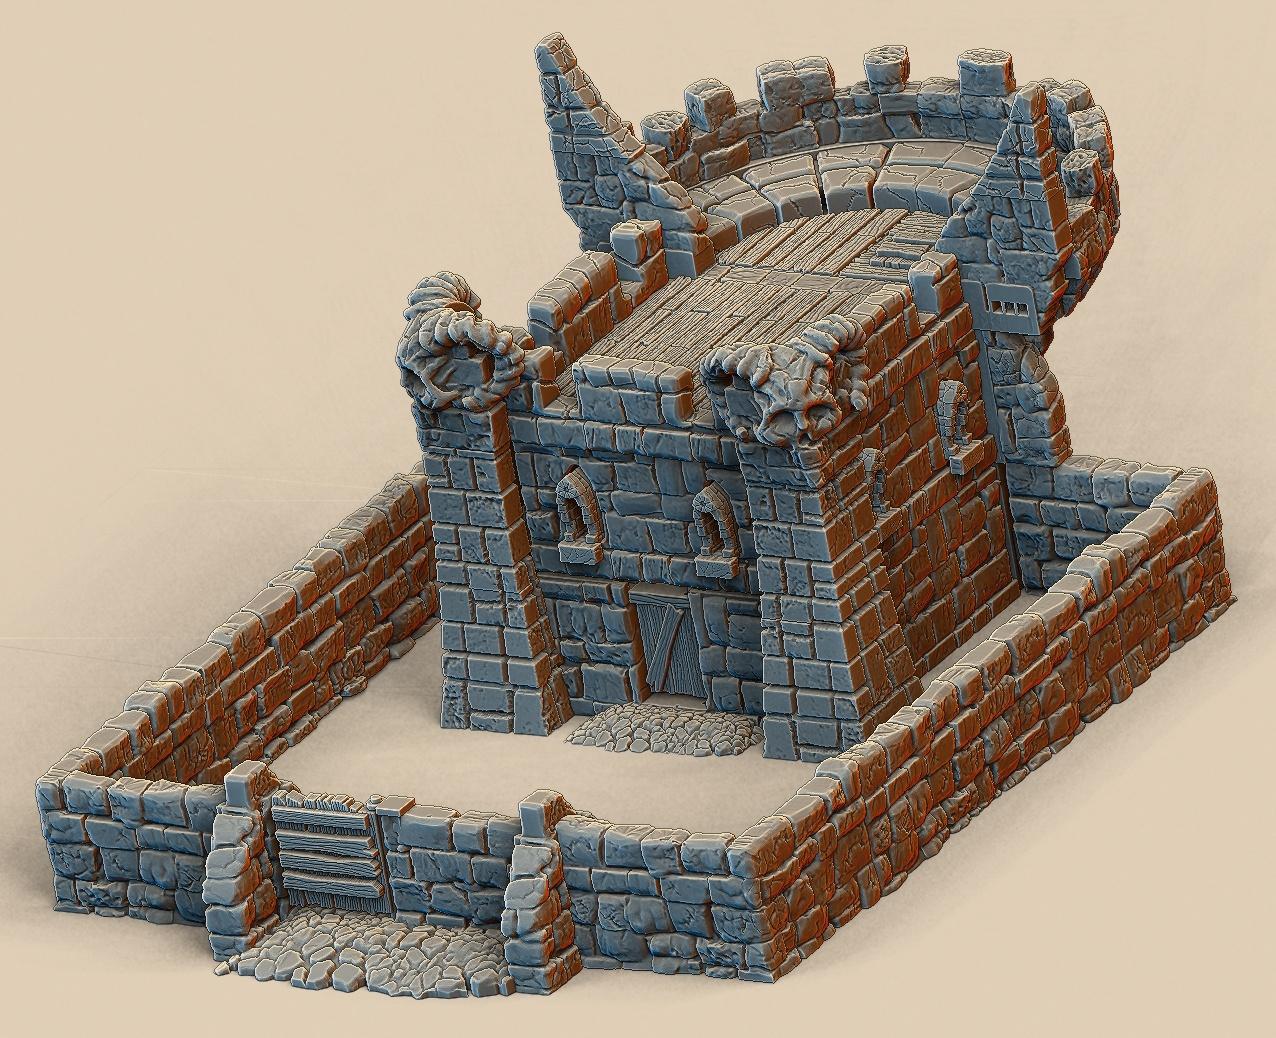 Free Mini Keep For 3D Printing - 3D Printable Terrain - Album On Imgur - Free 3D Printable Terrain